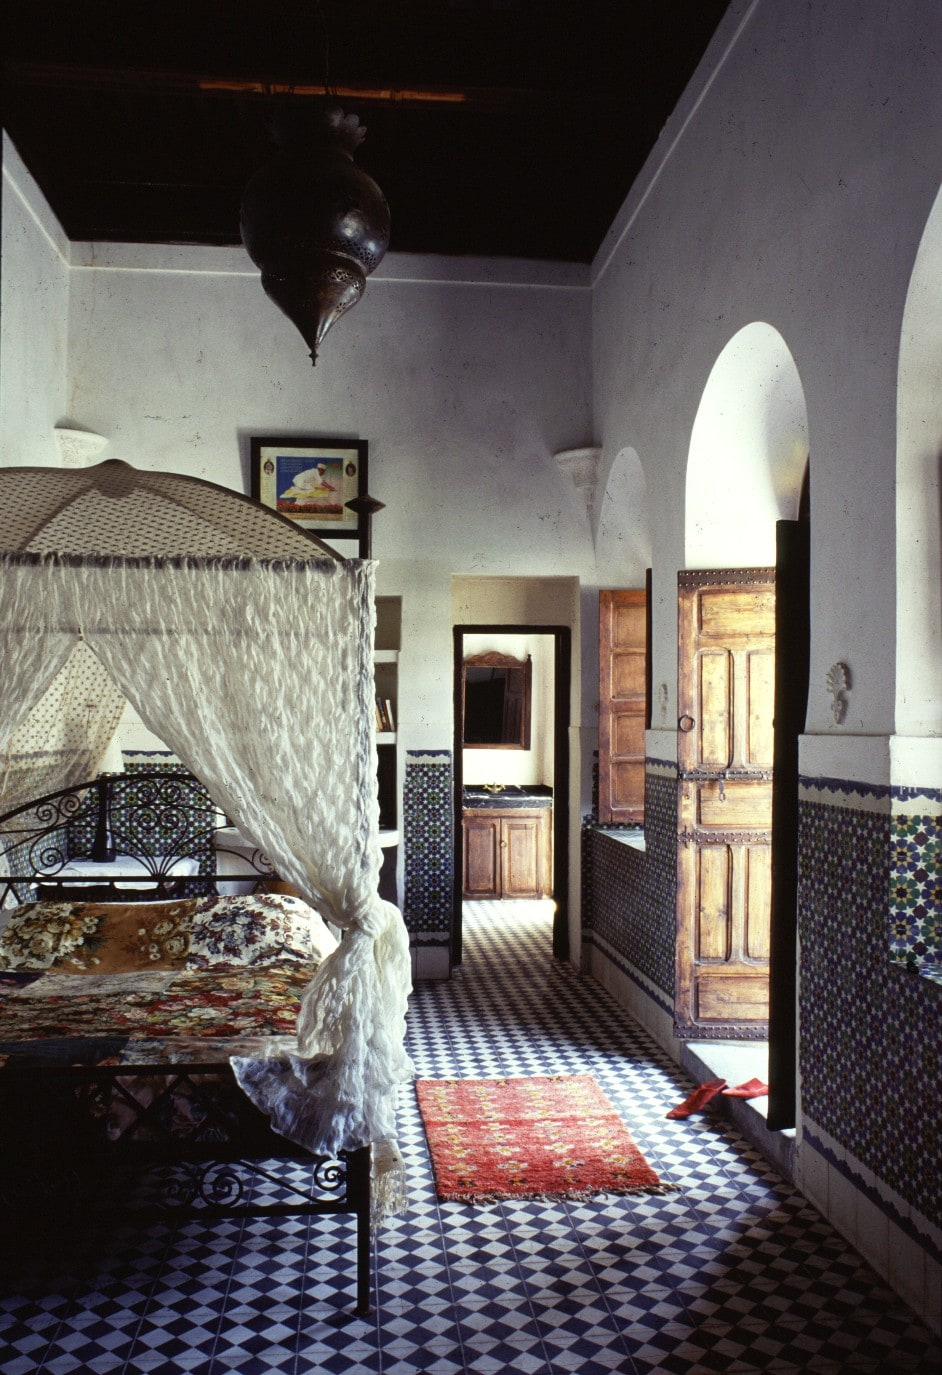 'Studio' bedroom with canopy bed